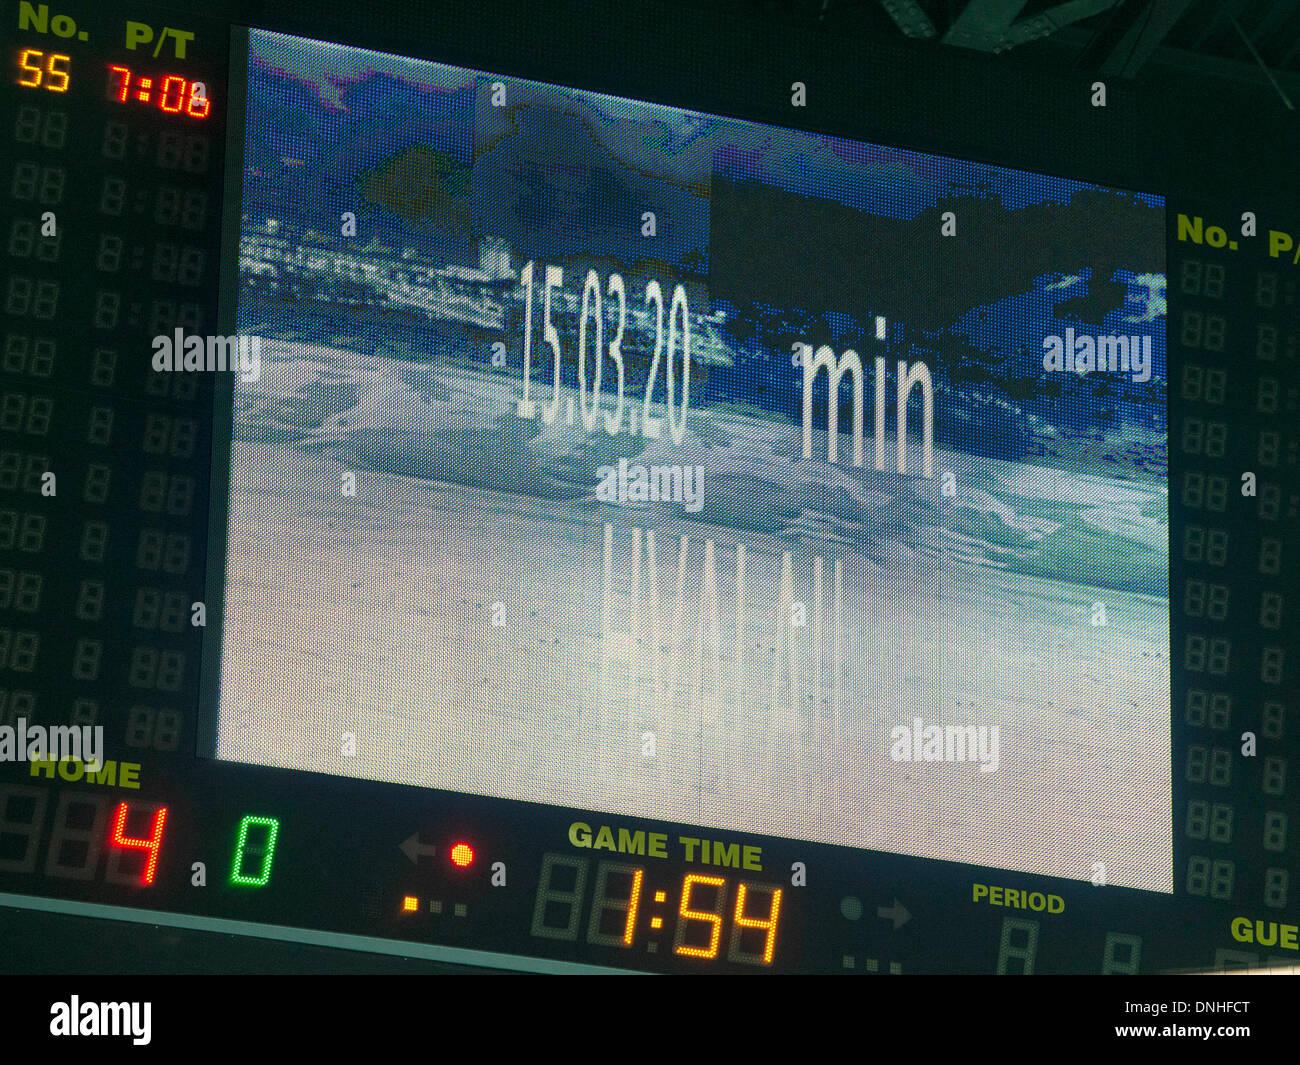 131230 131230) -- zagreb, december 30, 2013 (xinhua) - a screen